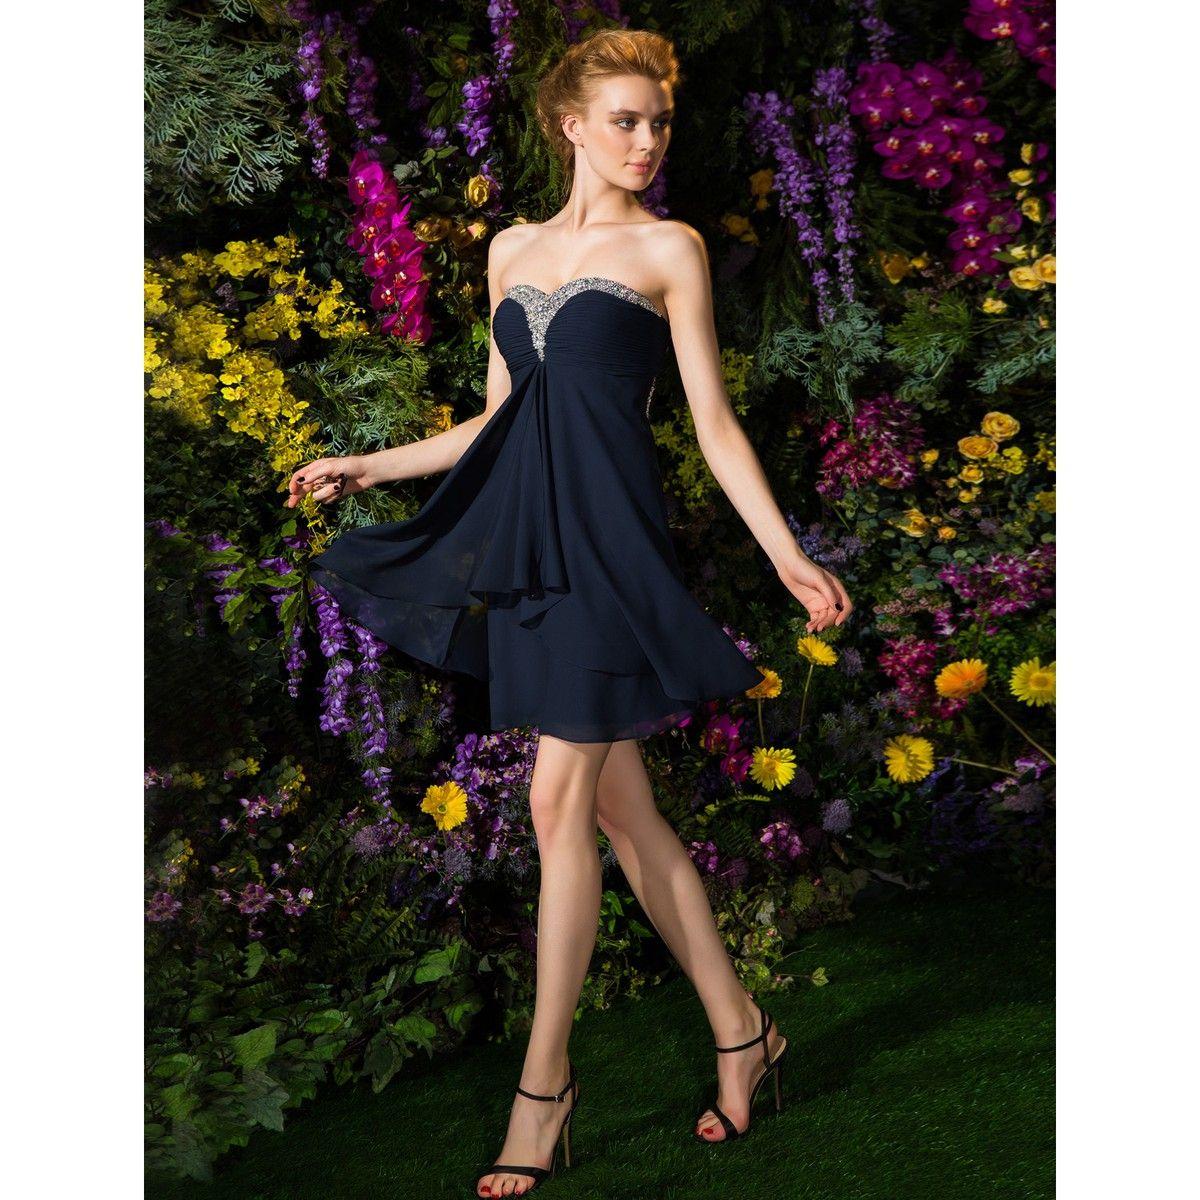 Sheath/Column Sweetheart Short/Mini Chiffon Bridesmaid Dress